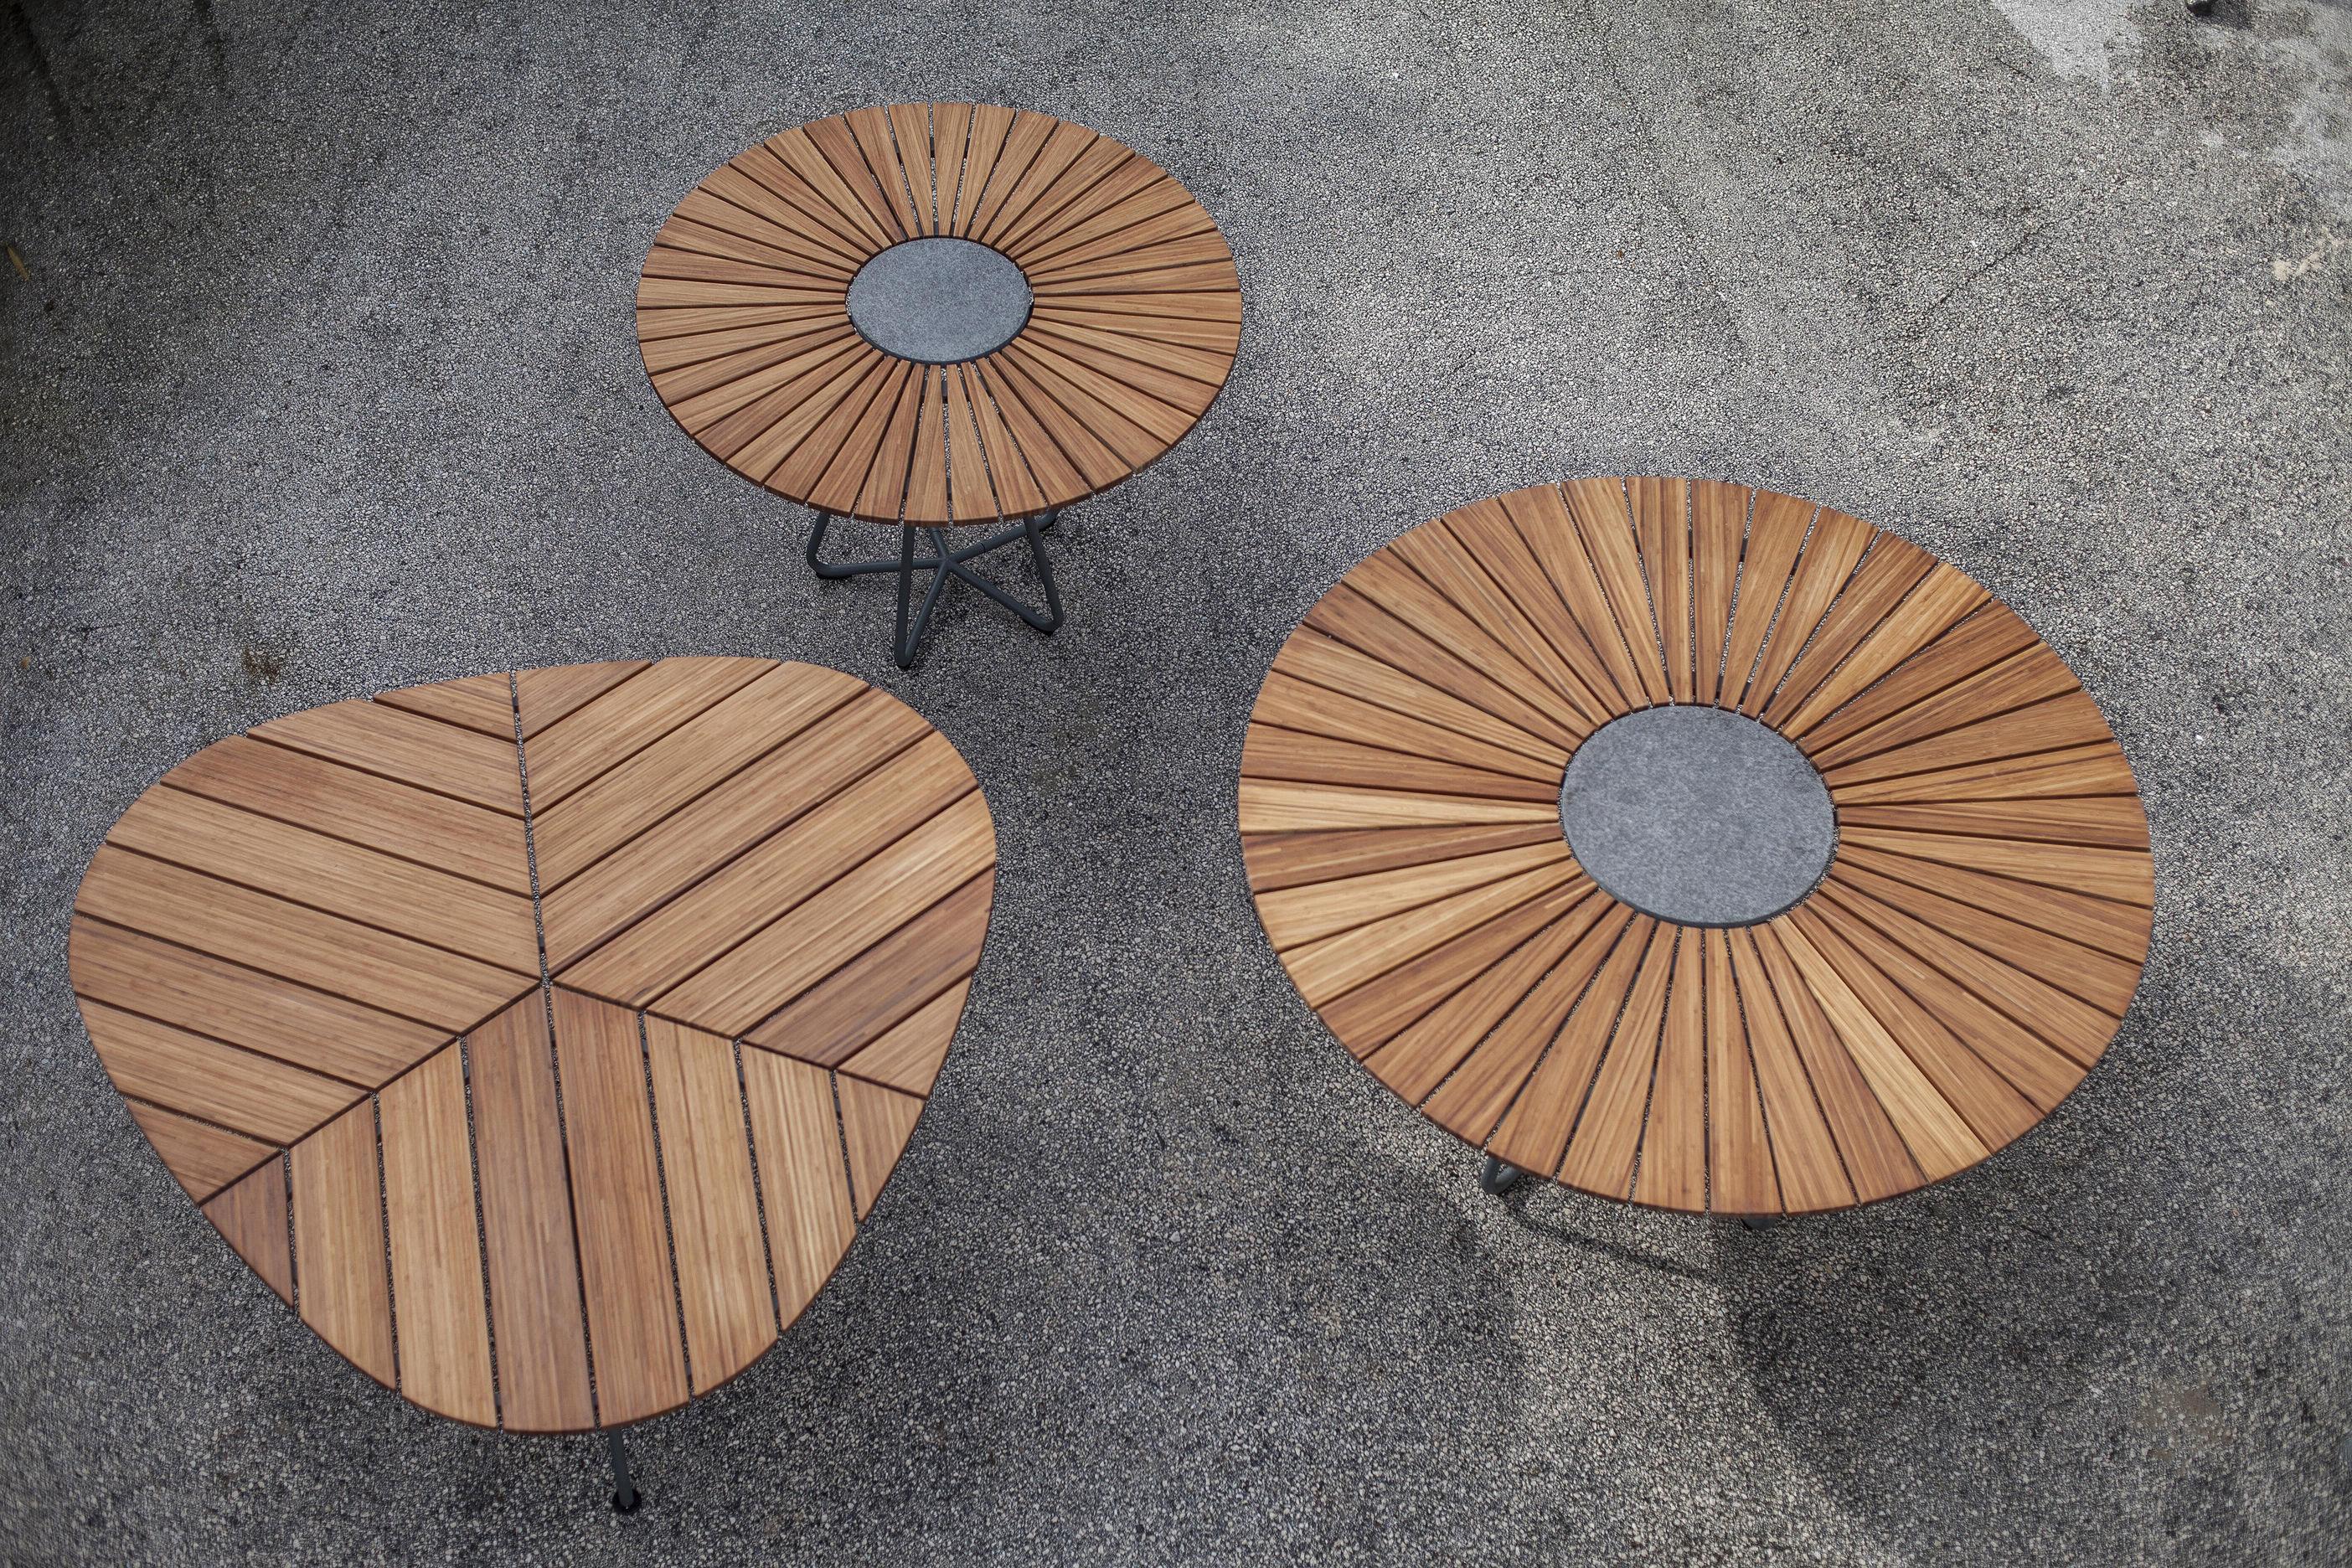 table de jardin leaf bambou triangulaire 146 x 146 x 146 cm bambou pi tement gris houe. Black Bedroom Furniture Sets. Home Design Ideas